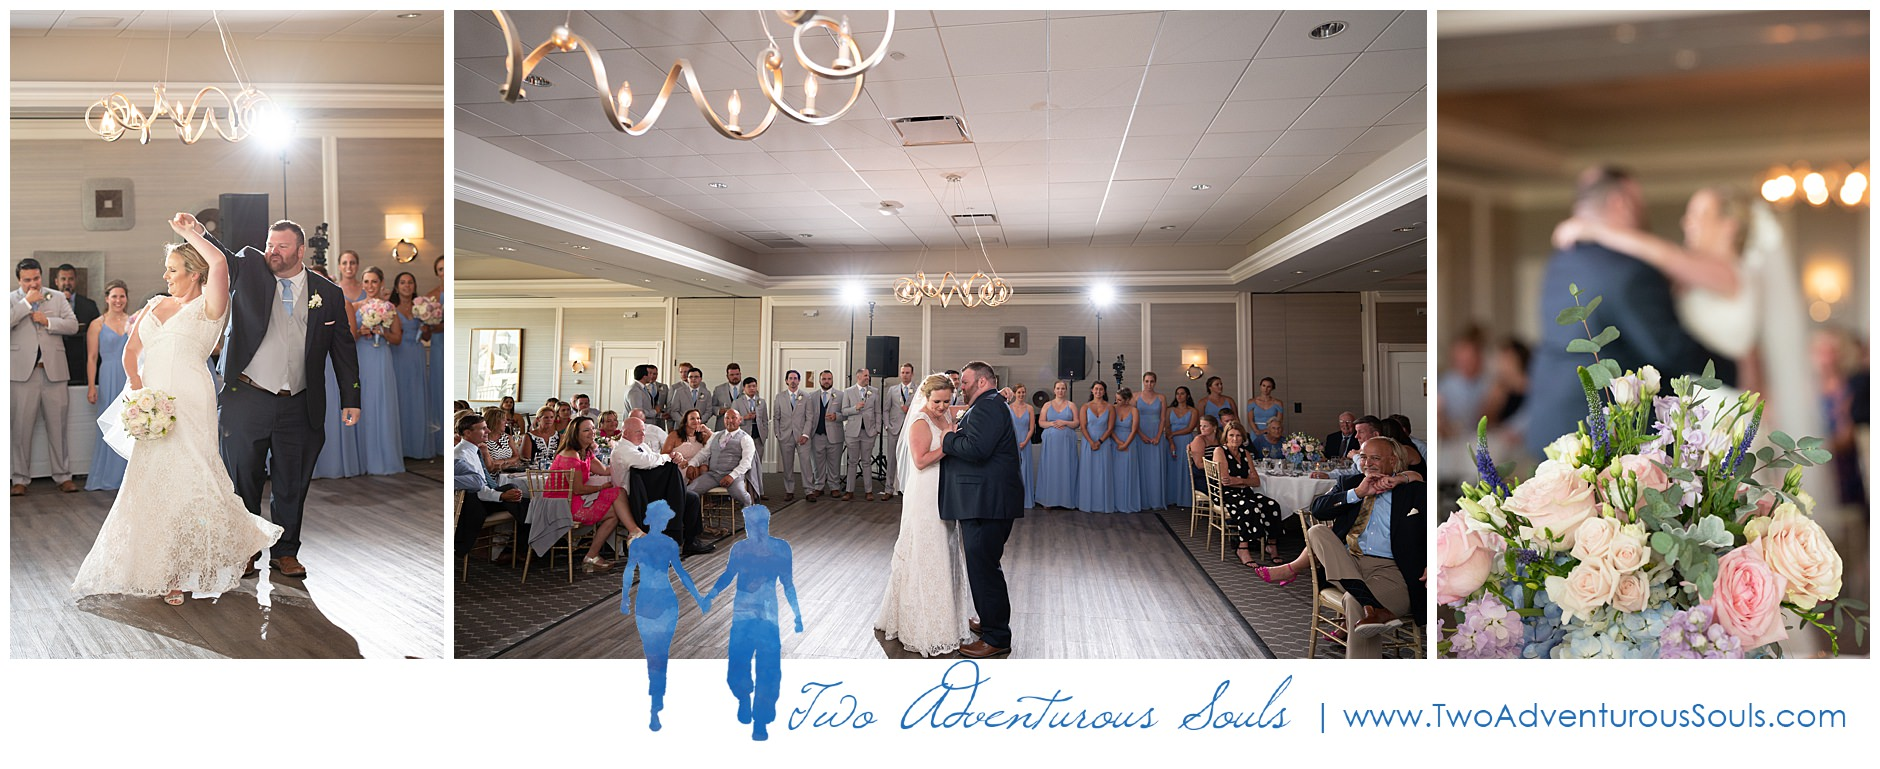 Cape Cod Wedding Photographers, Destination Wedding Photographers, Two Adventurous Souls-081019_0043.jpg